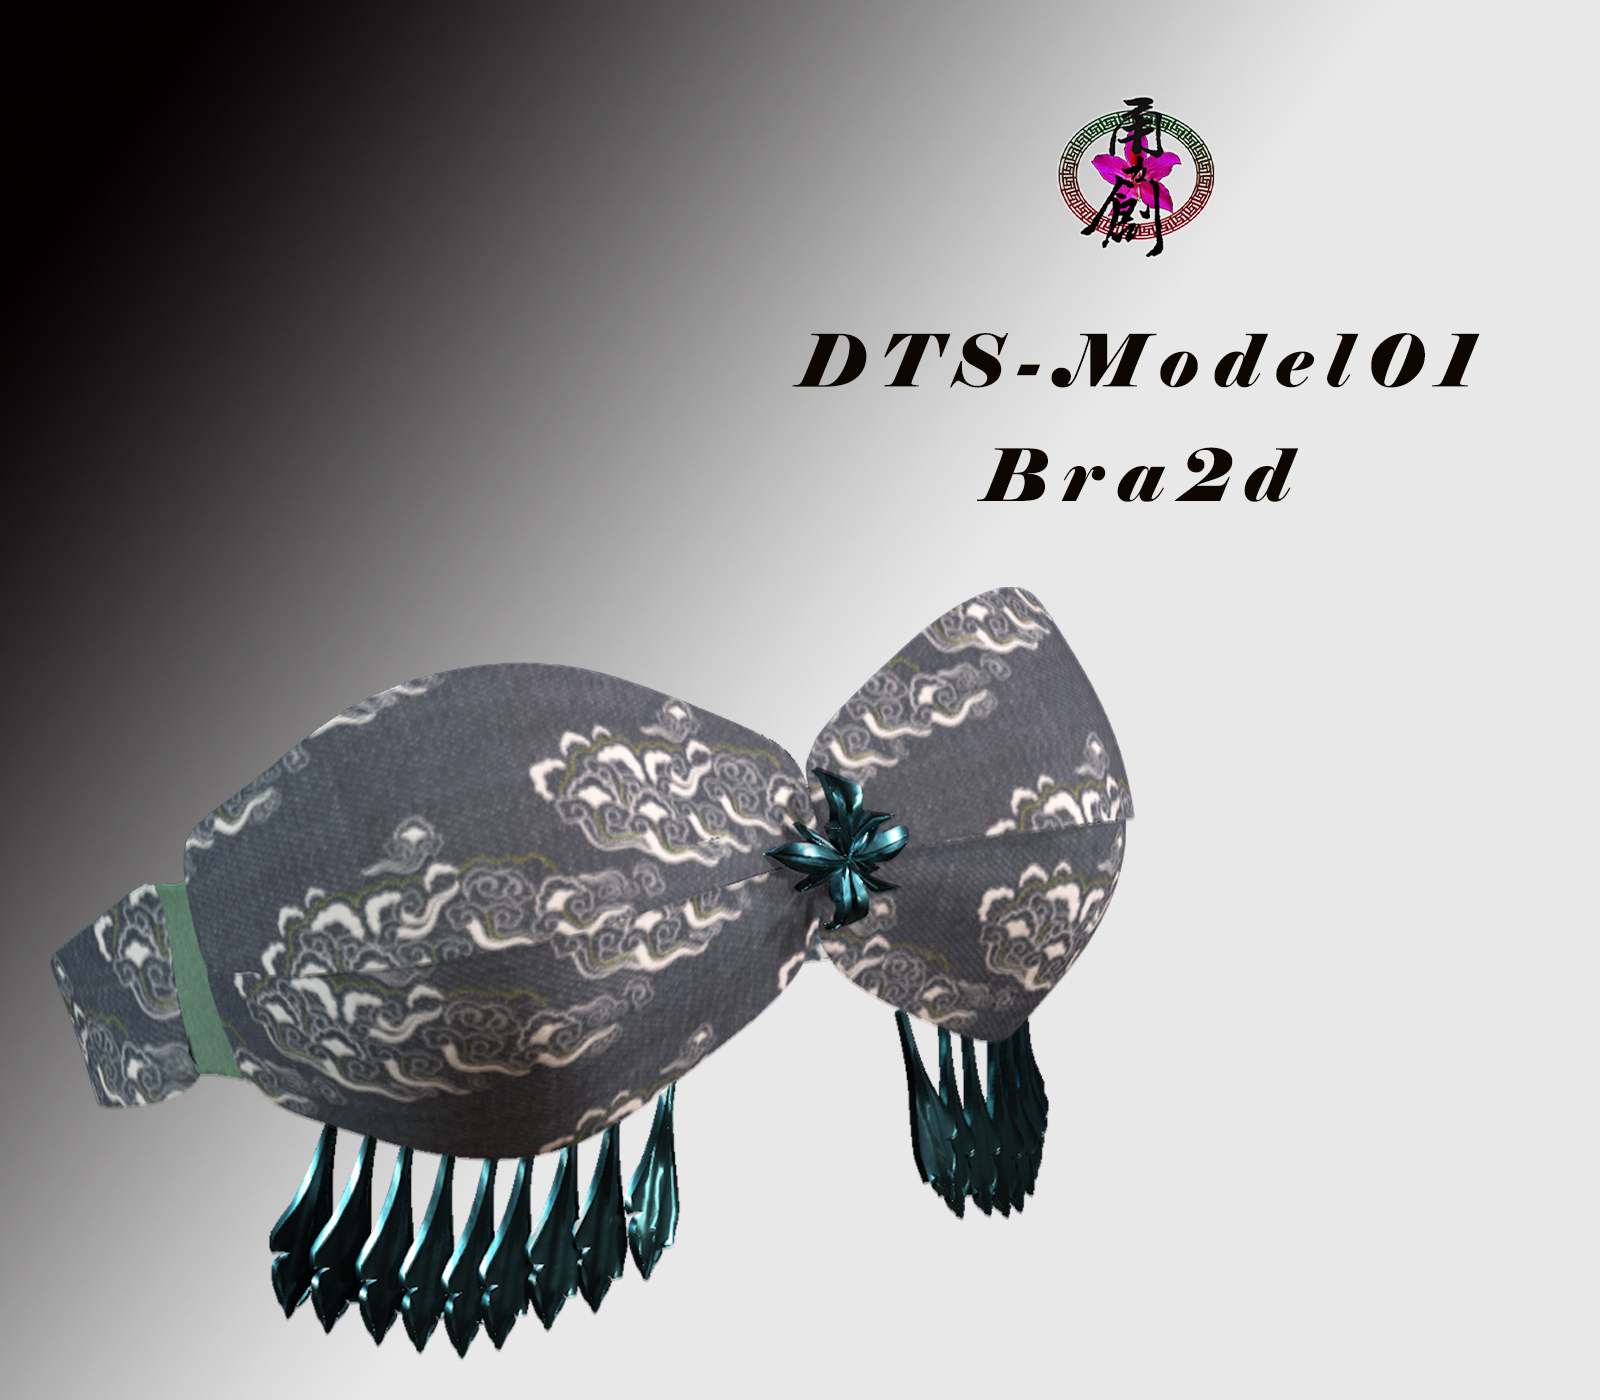 FBX-DTS-Model01-Bra2D